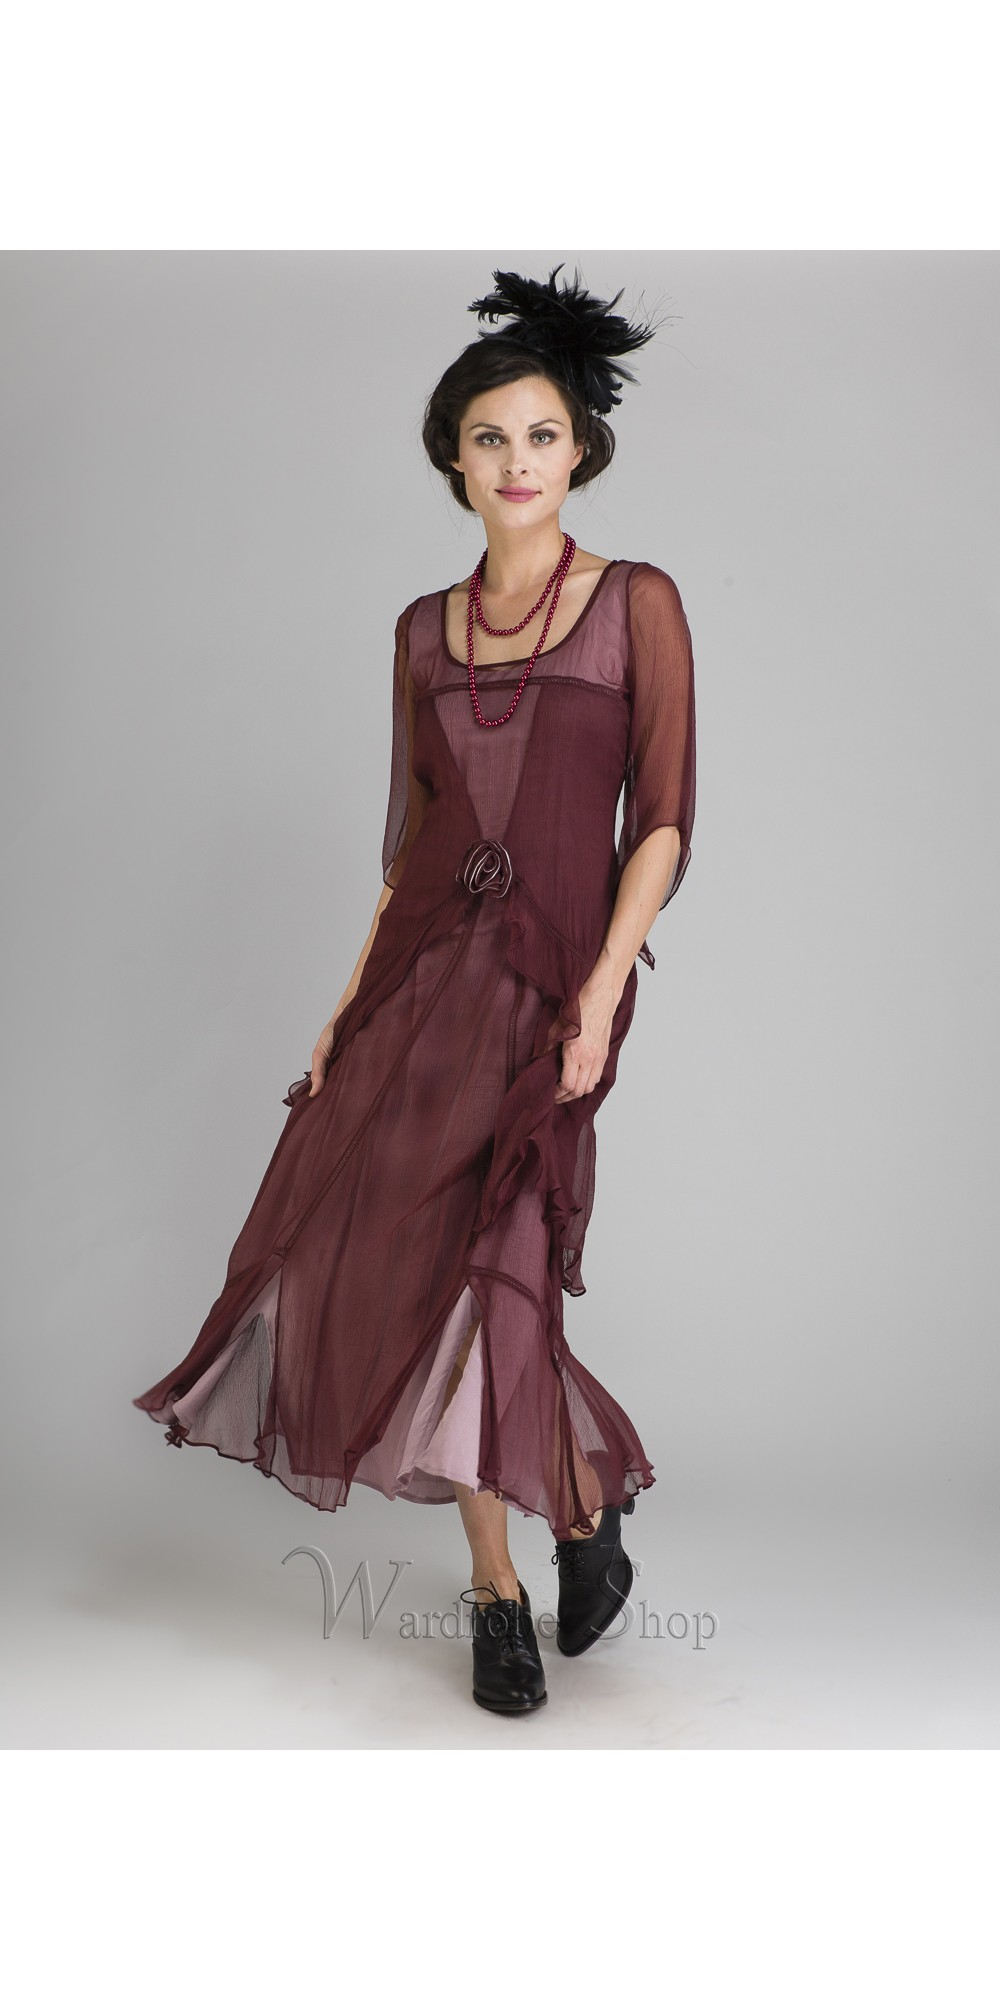 Great Gatsby Party Dress in Garnet by Nataya